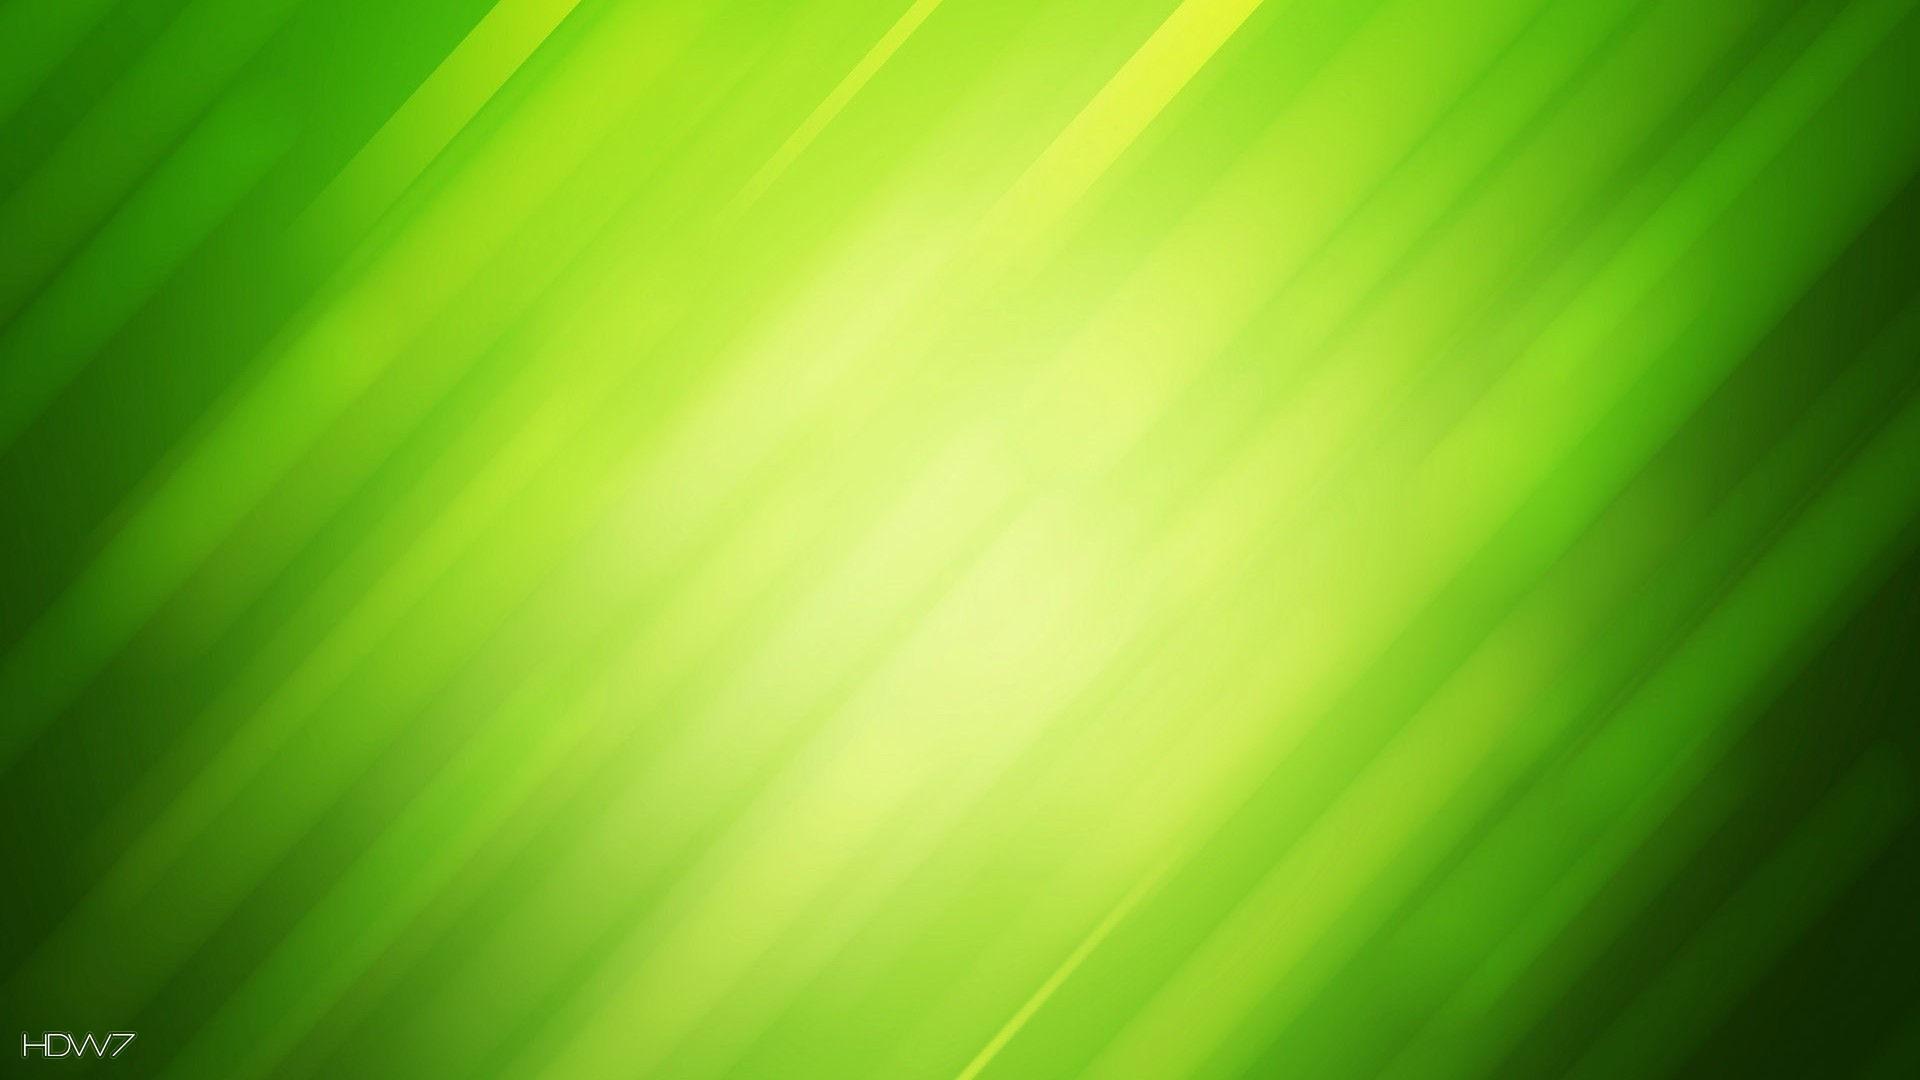 green abstract hd wallpaper 1080p